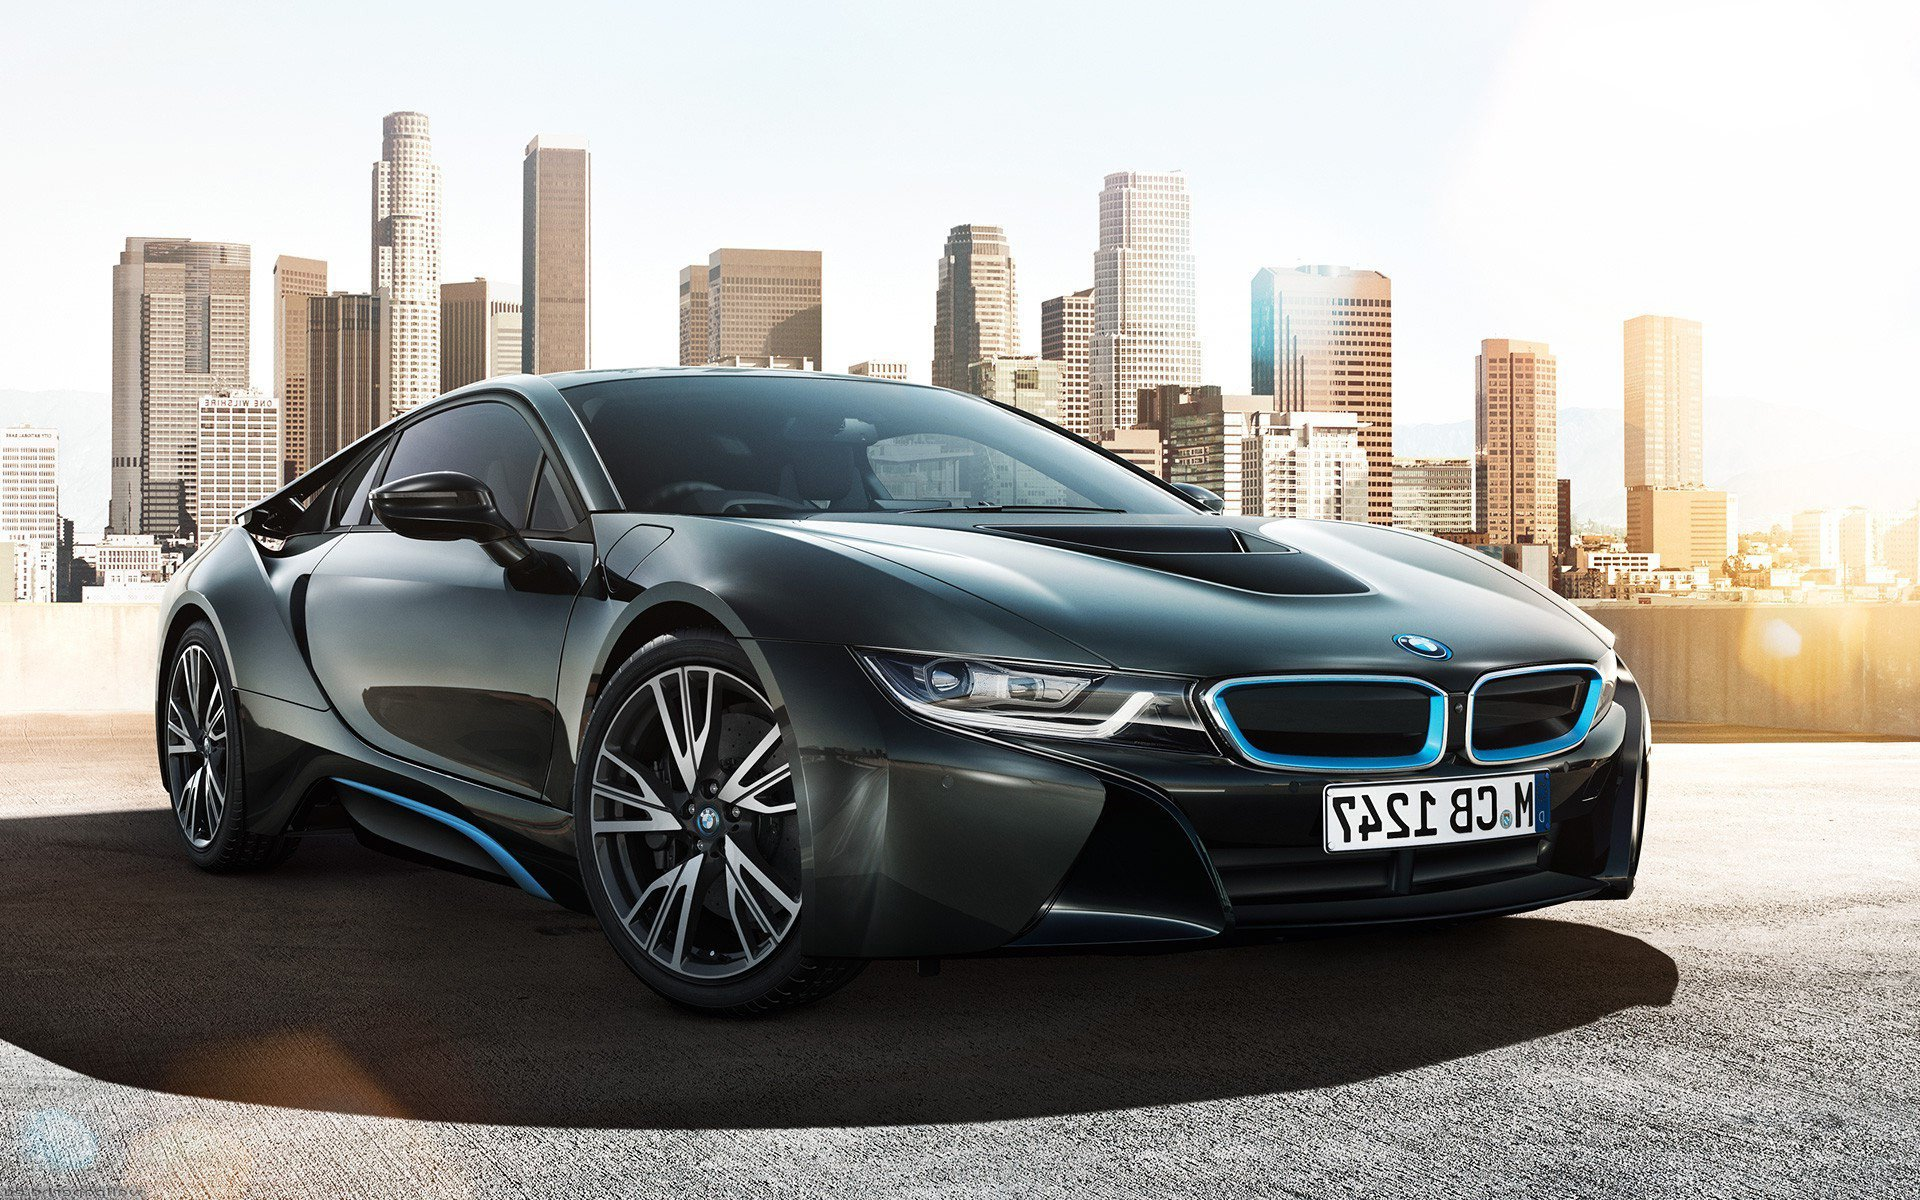 Bmw I8 Car Concept 4k Hd Desktop Wallpaper For 4k Ultra Hd: BMW I8 Concept, HD Cars, 4k Wallpapers, Images